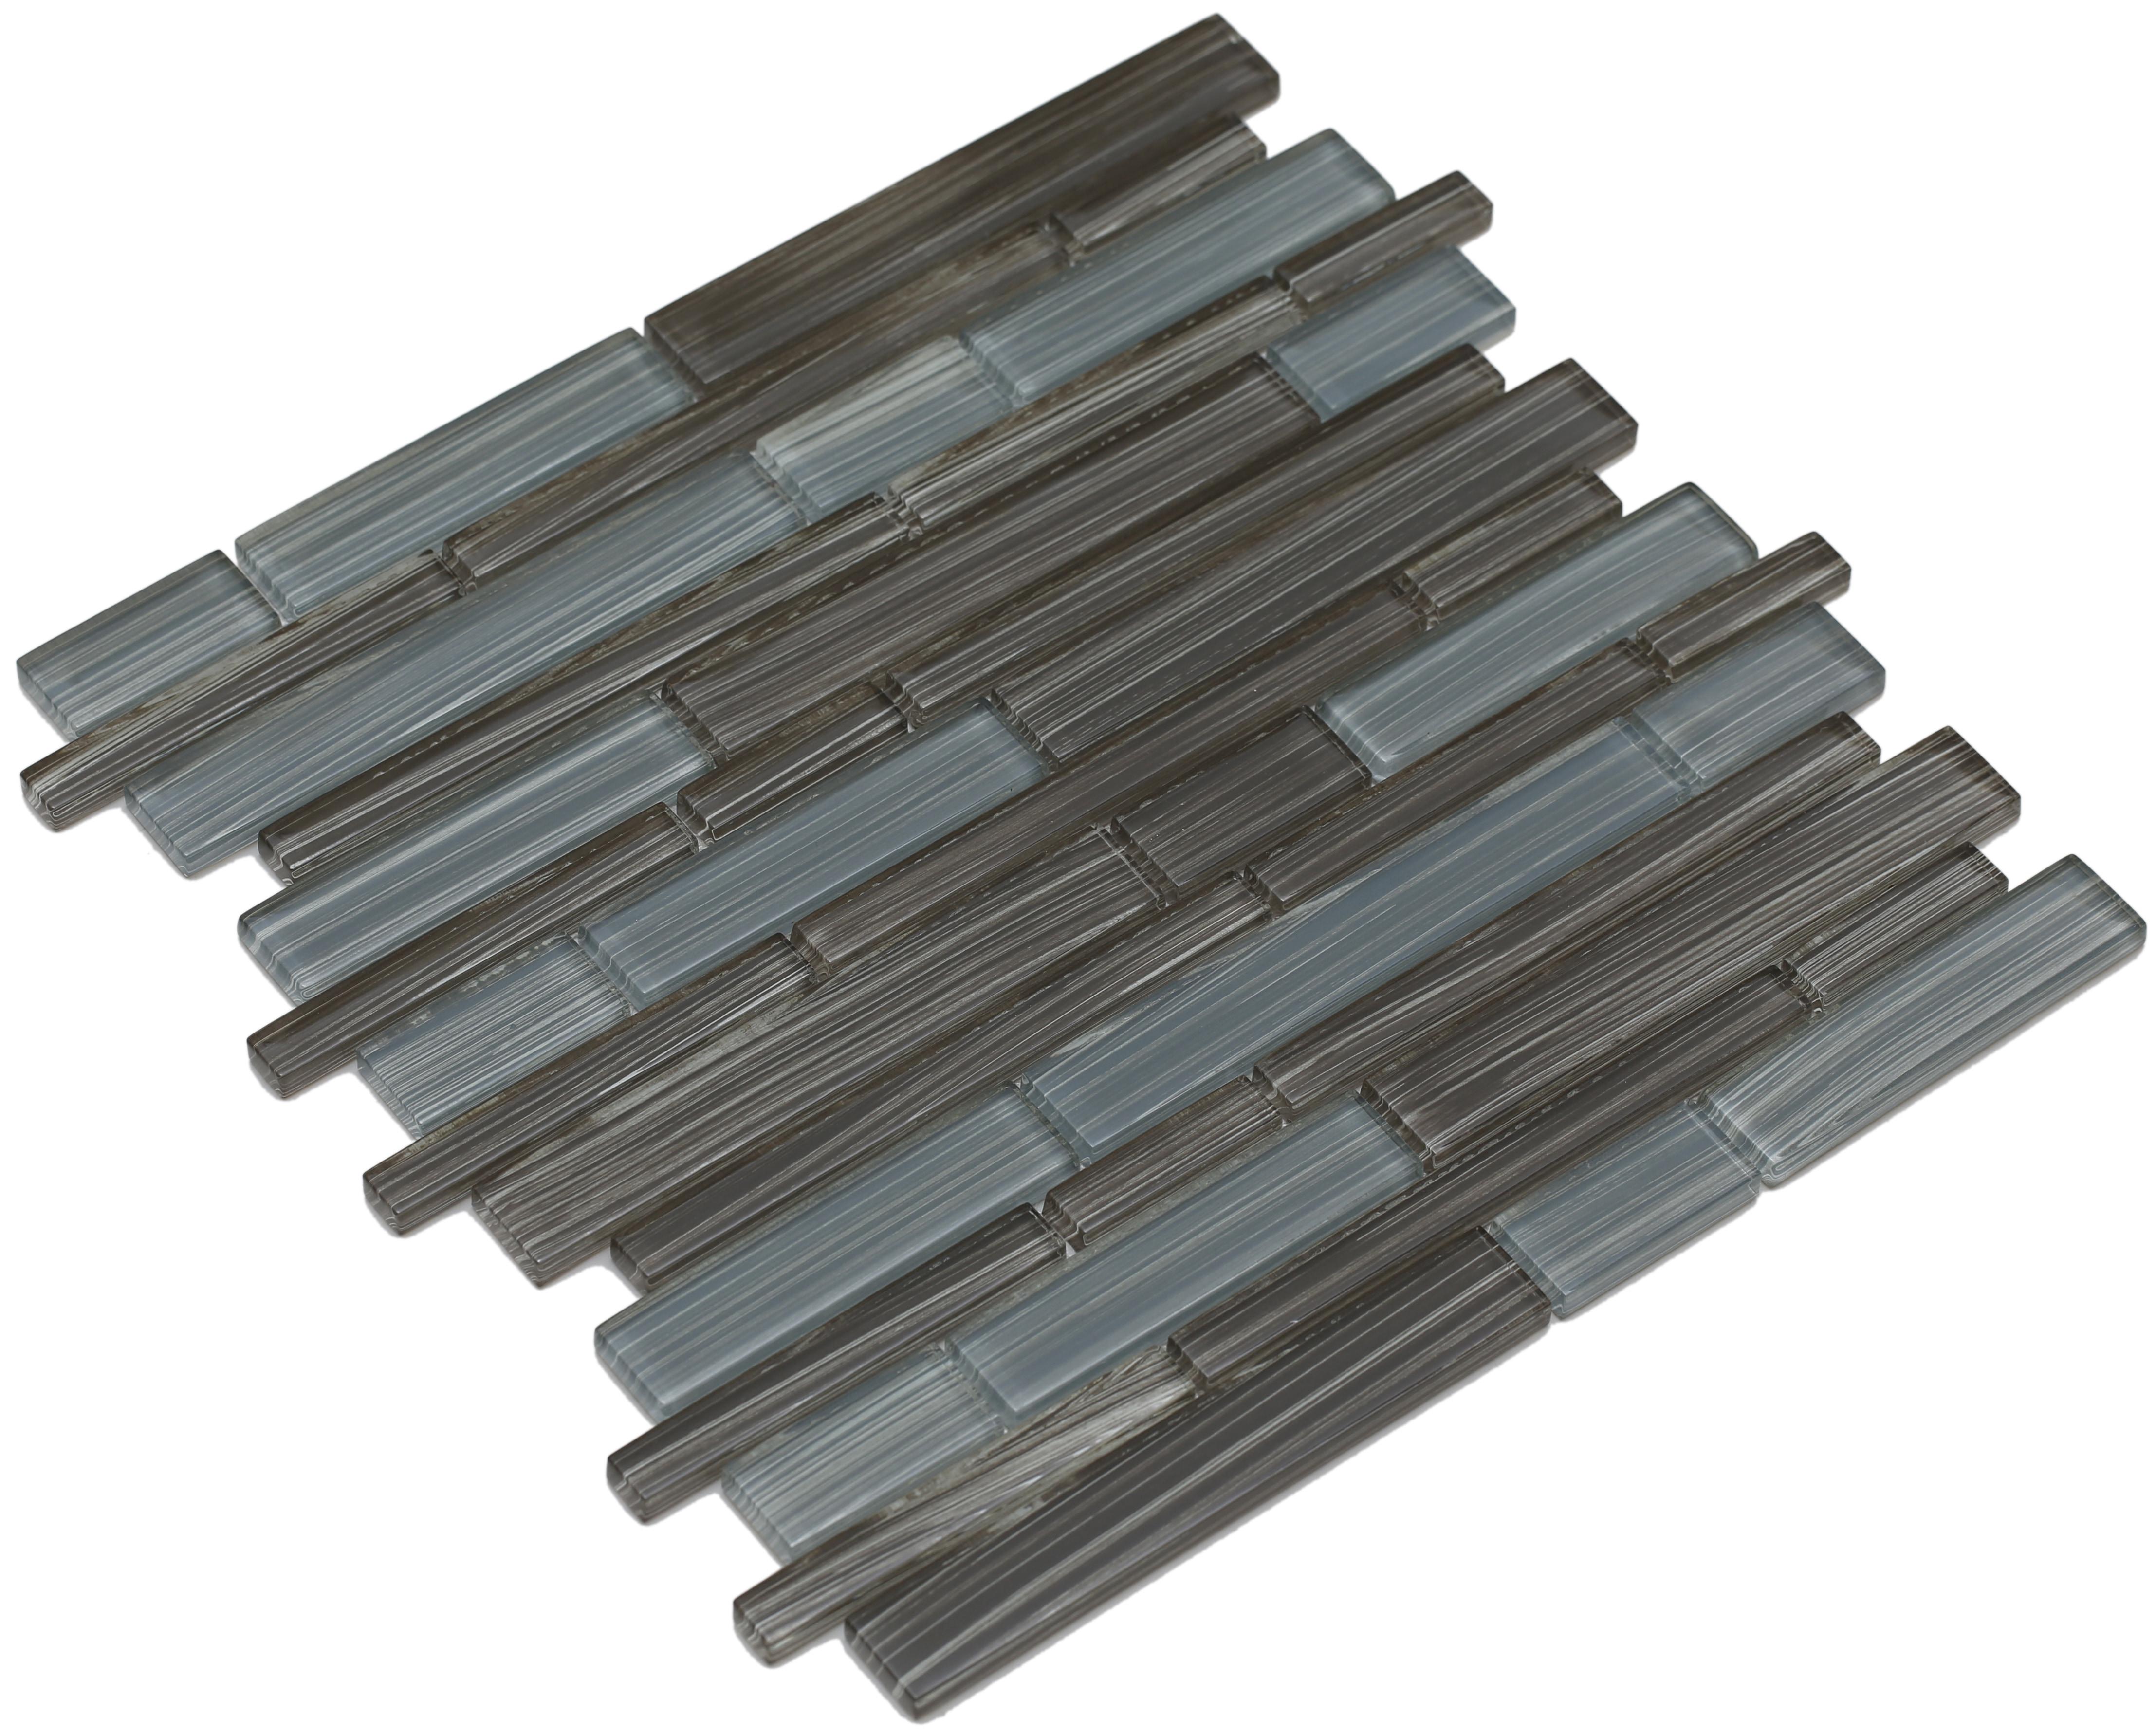 Varying brown and gray hand painted glass / Interlocking Mahi Series 0